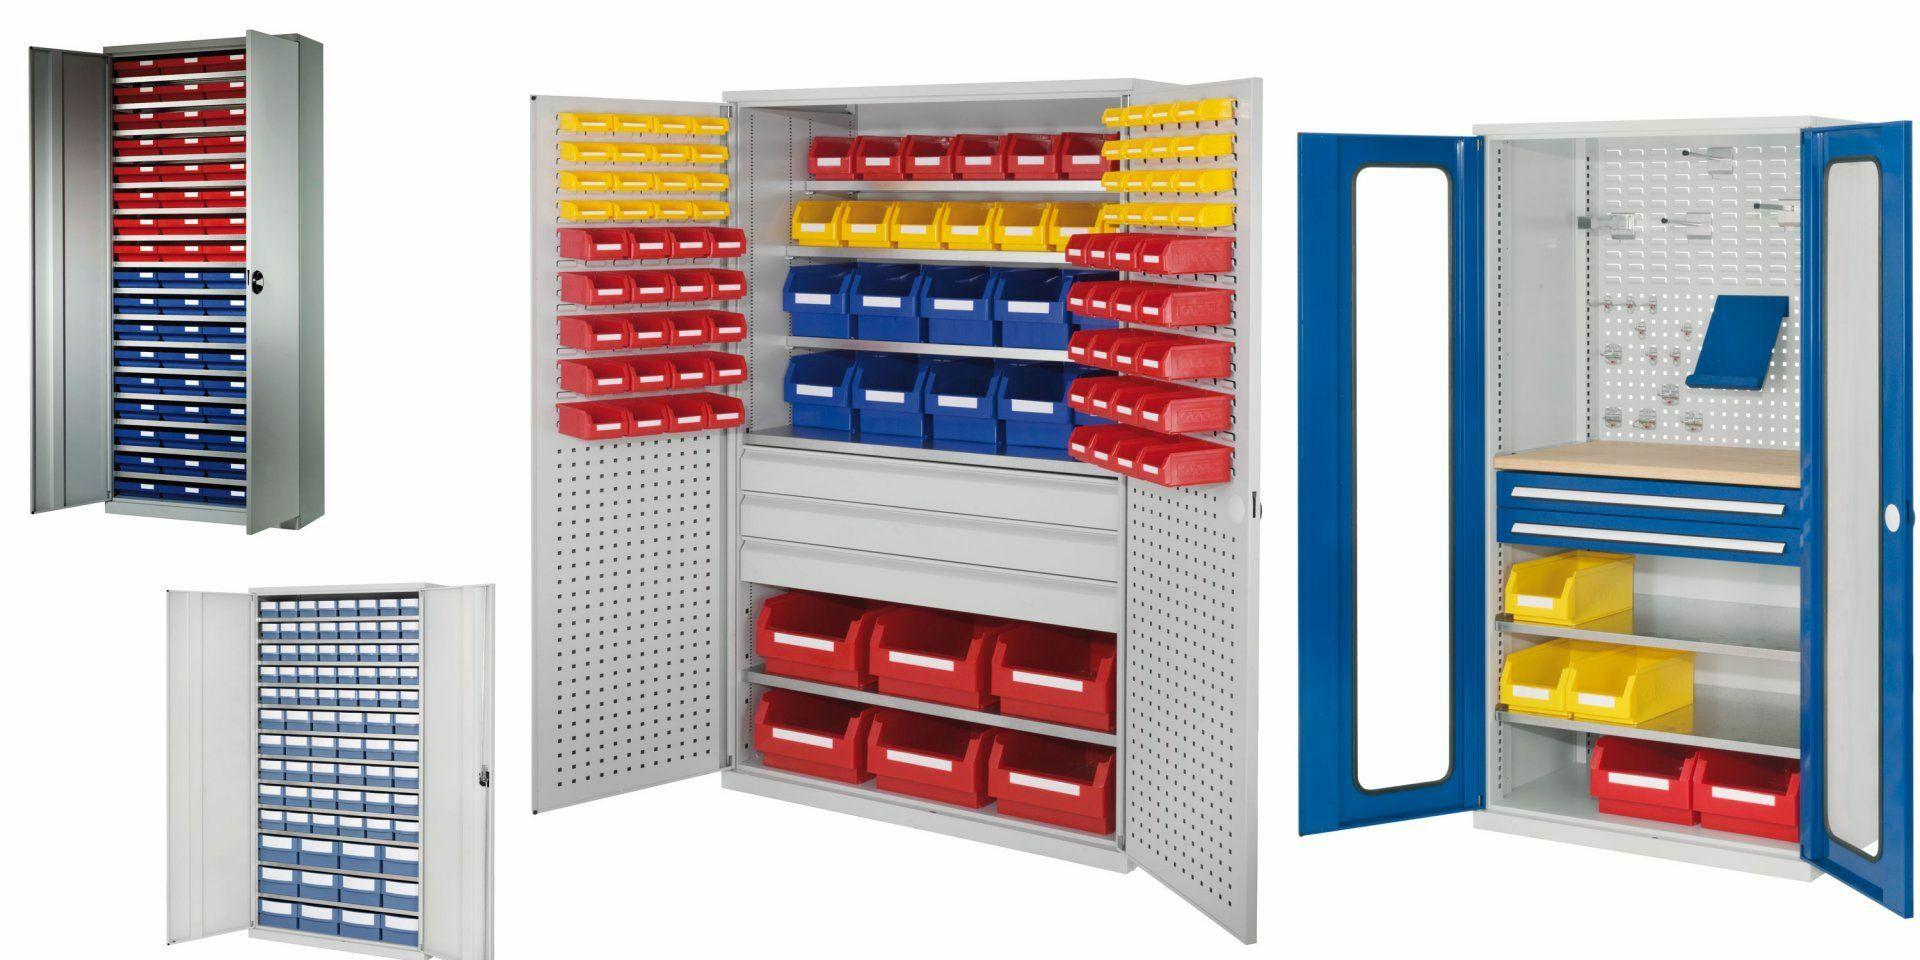 ordnungssysteme günstig kaufen | padberg + palatec shop